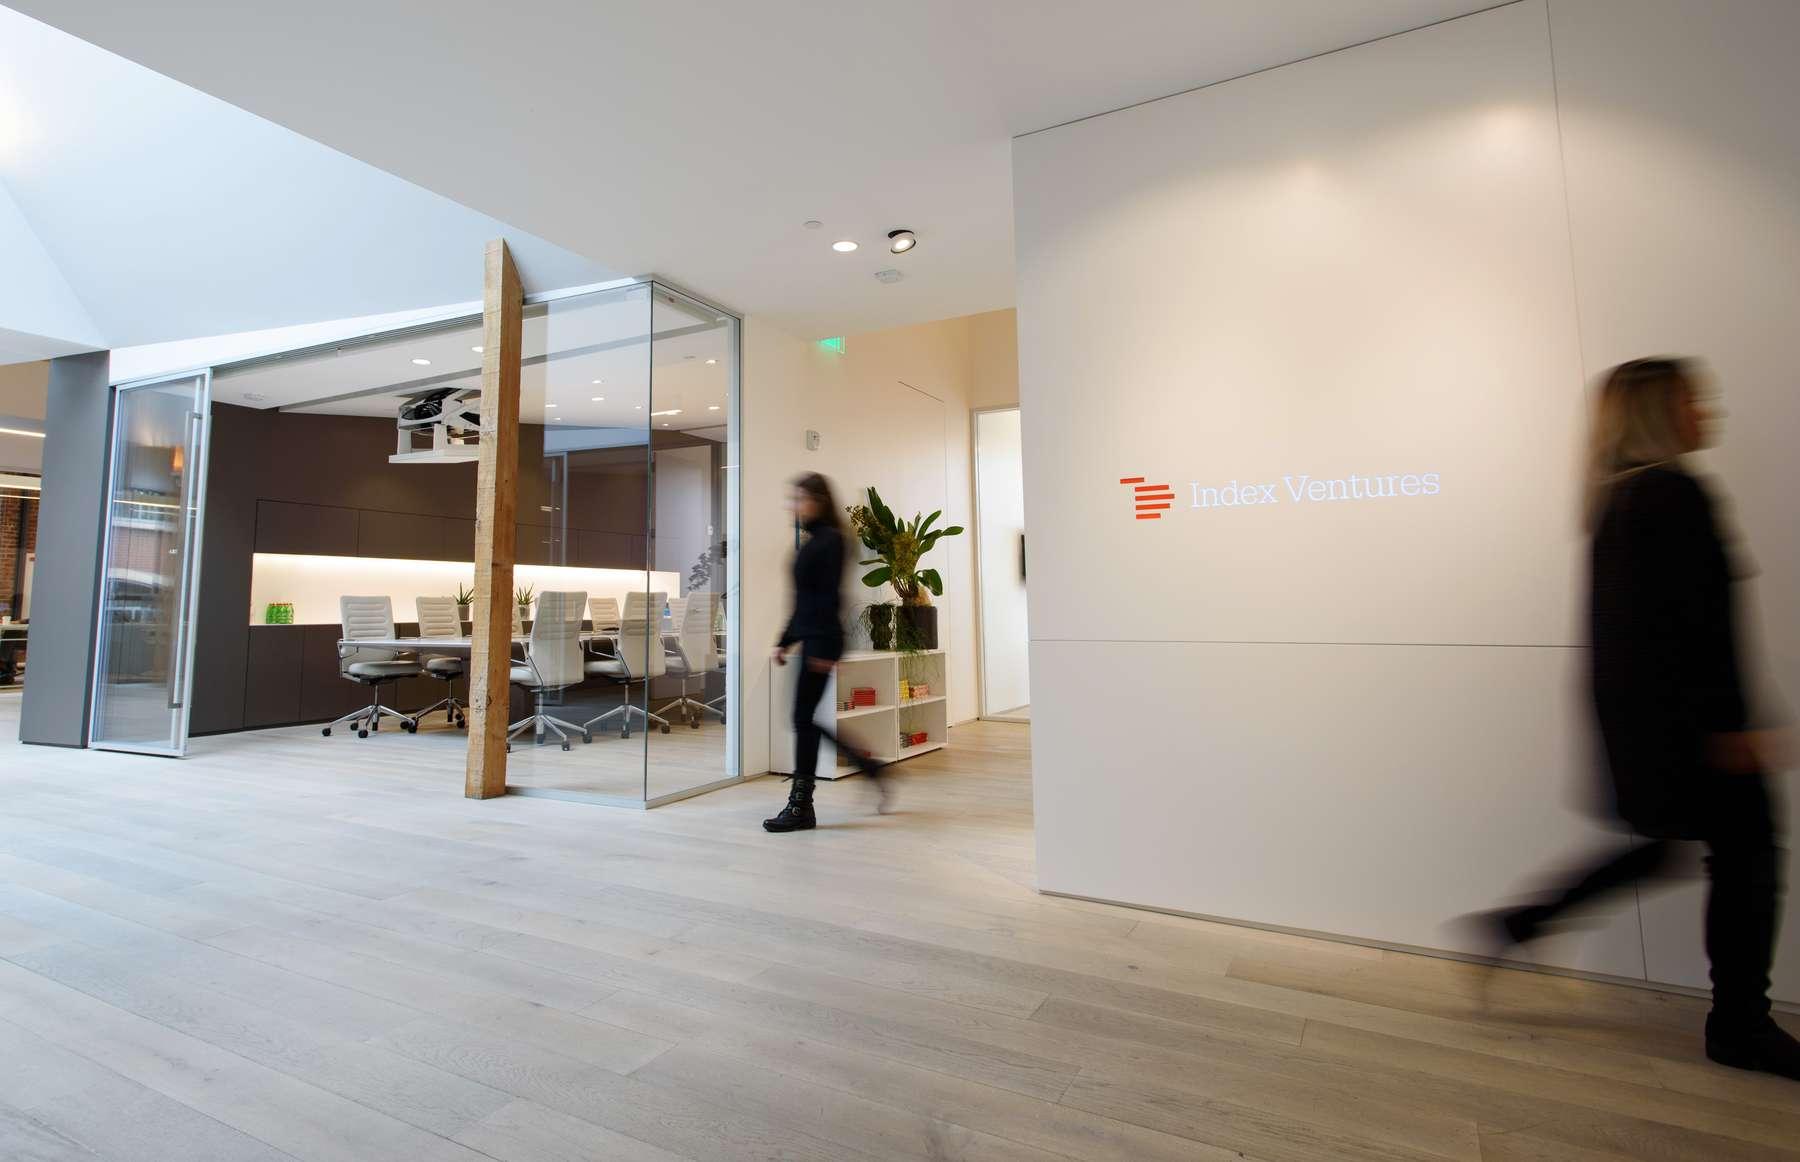 Index Ventures, San Francisco